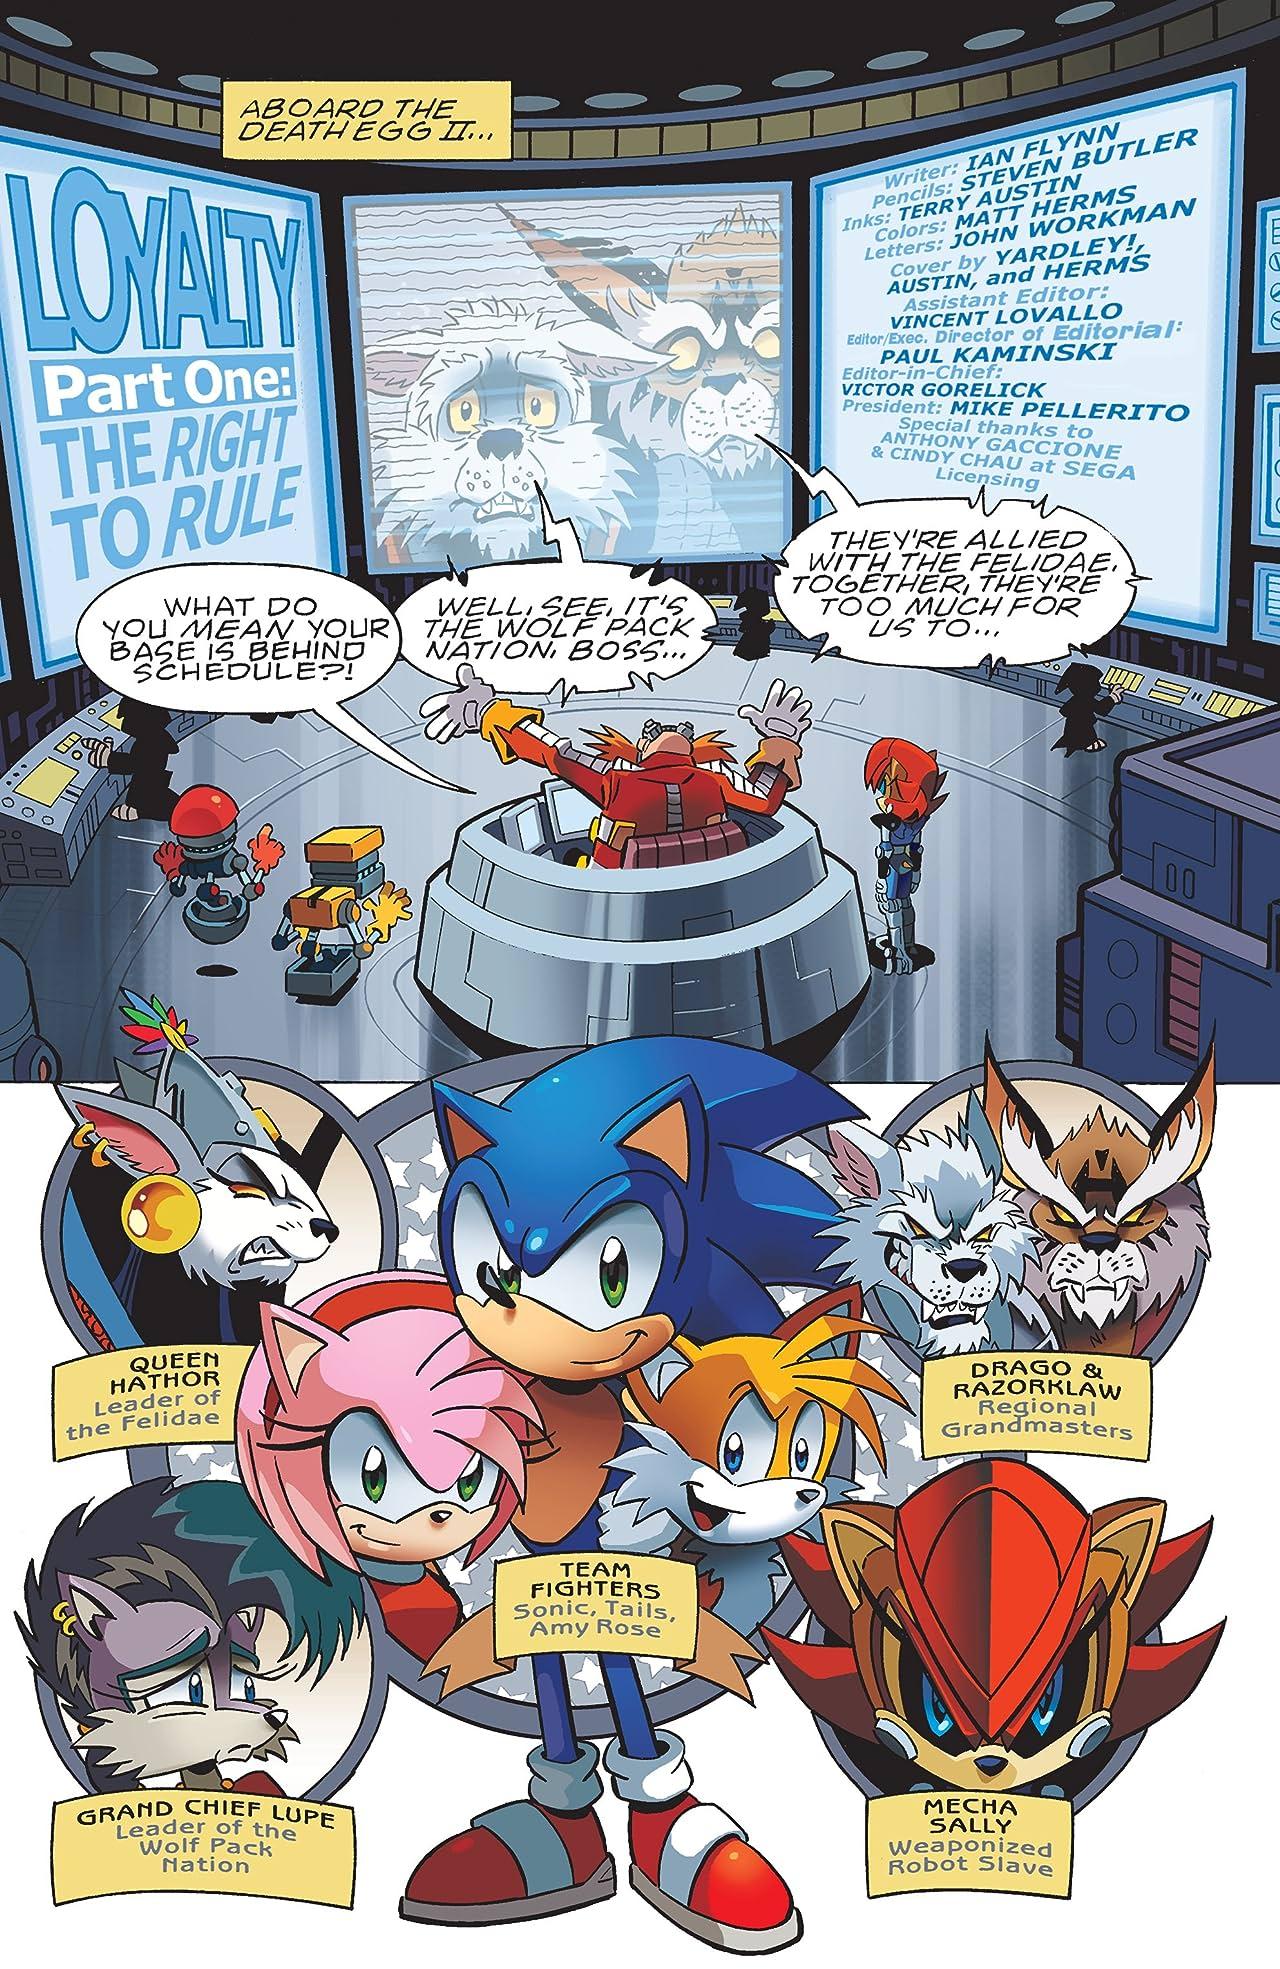 Sonic the Hedgehog #237